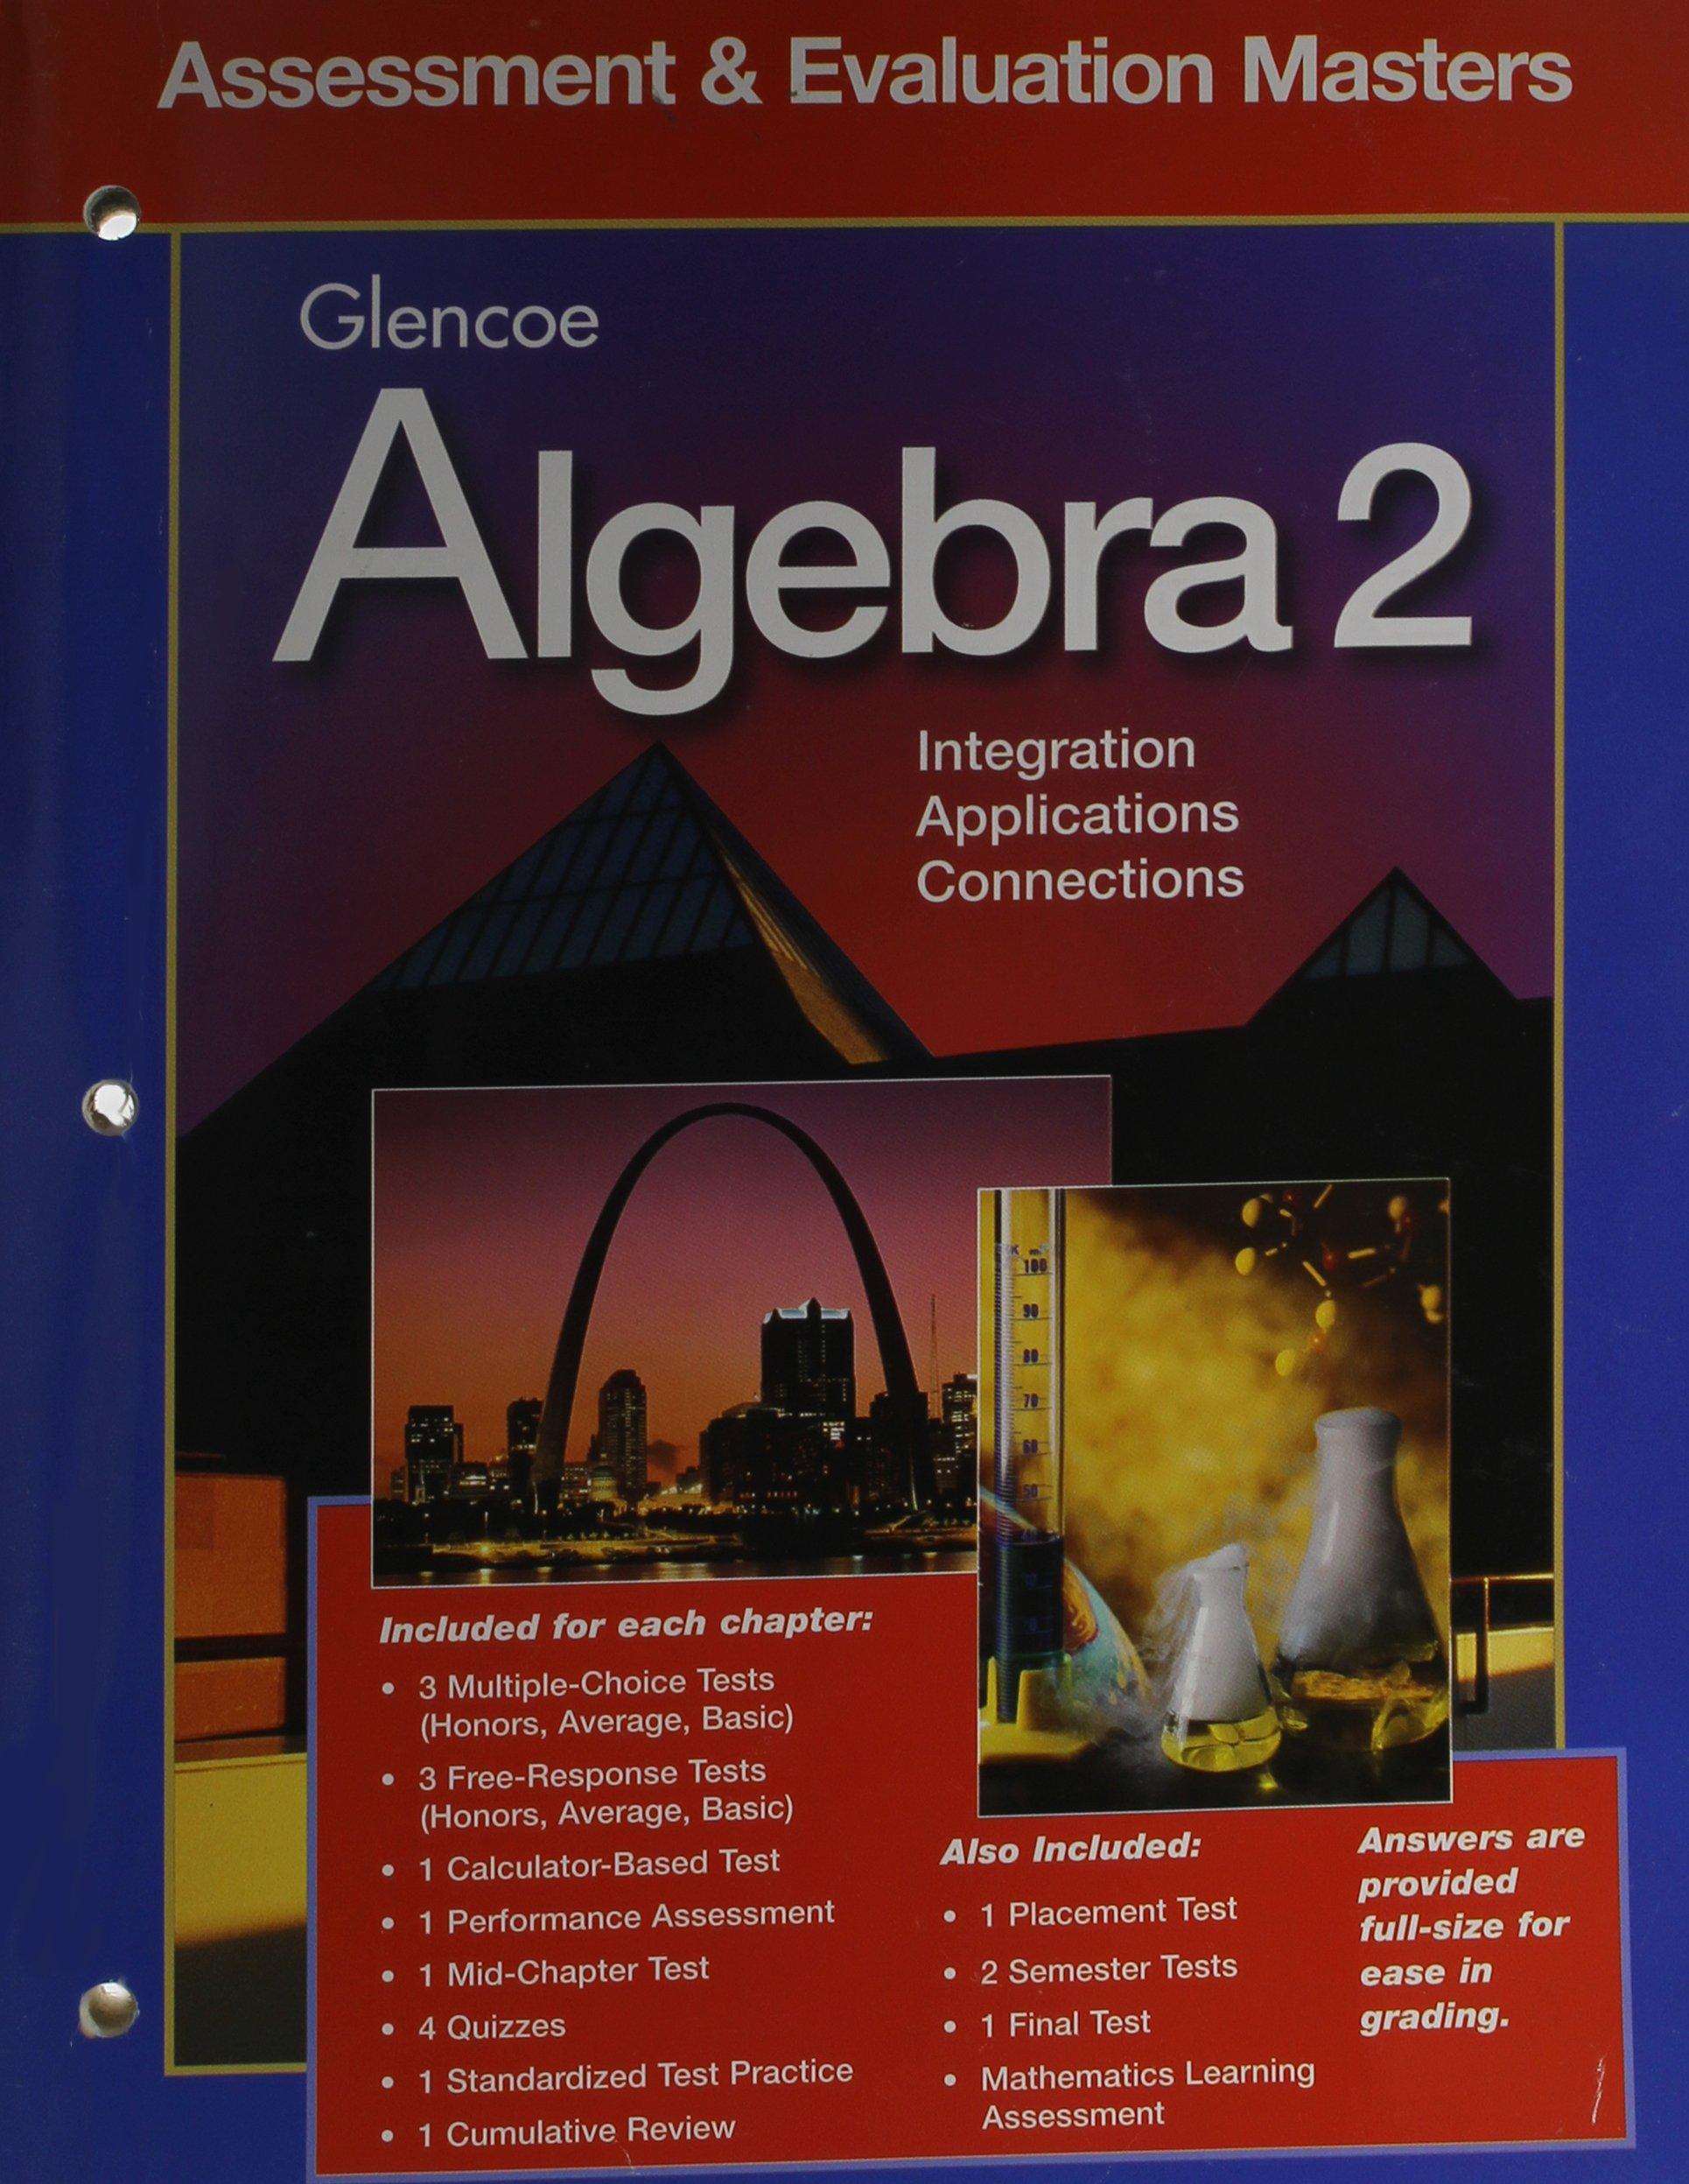 Algebra 2 Assessment and Evaluation Masters: Amazon co uk